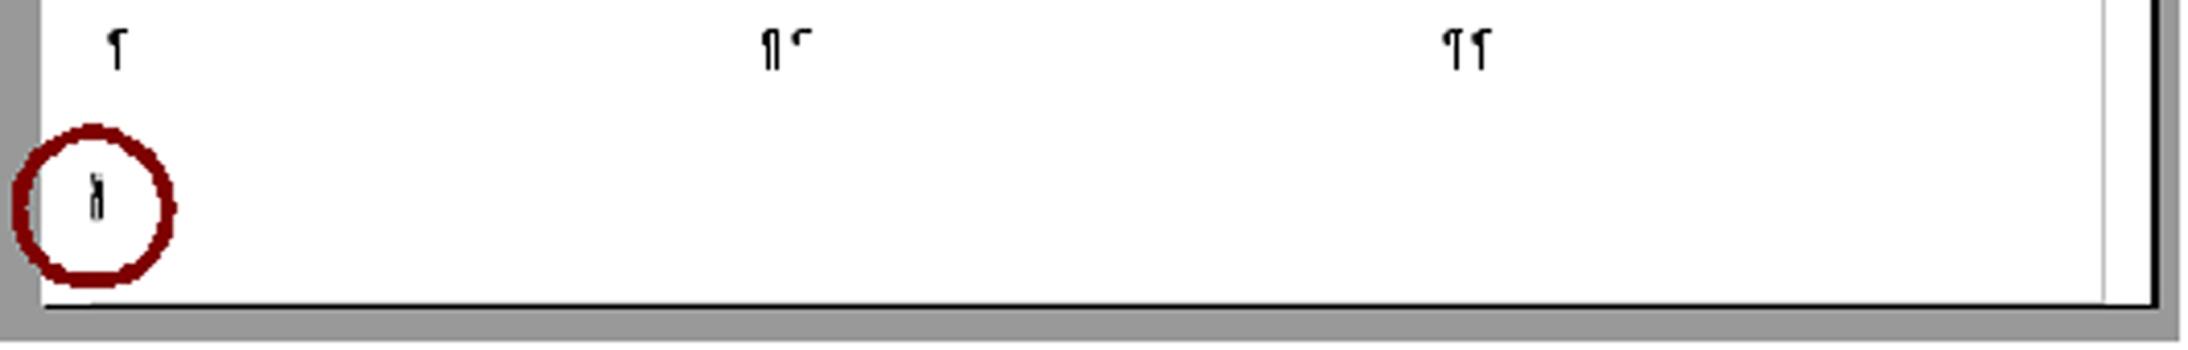 blank baseball field diagram   clip art